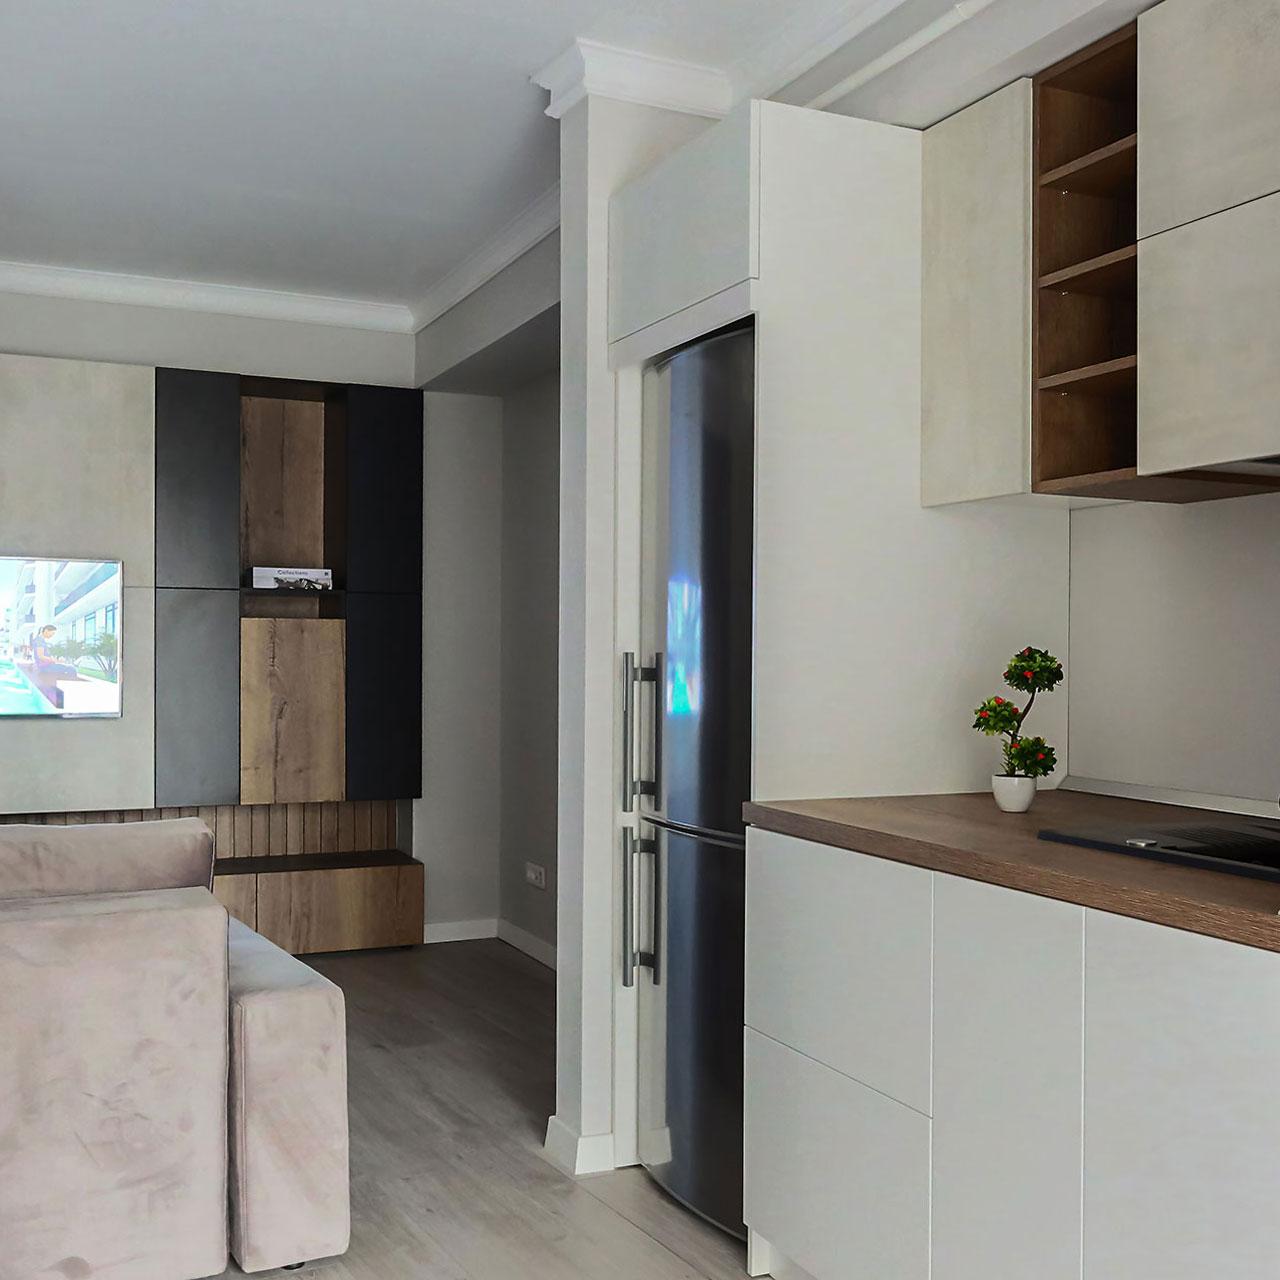 Apartamente de vanzare Bucuresti - Catedral Residence - Marriott, Piata Unirii, 13 Septembrie, Izvor - G2 - 2